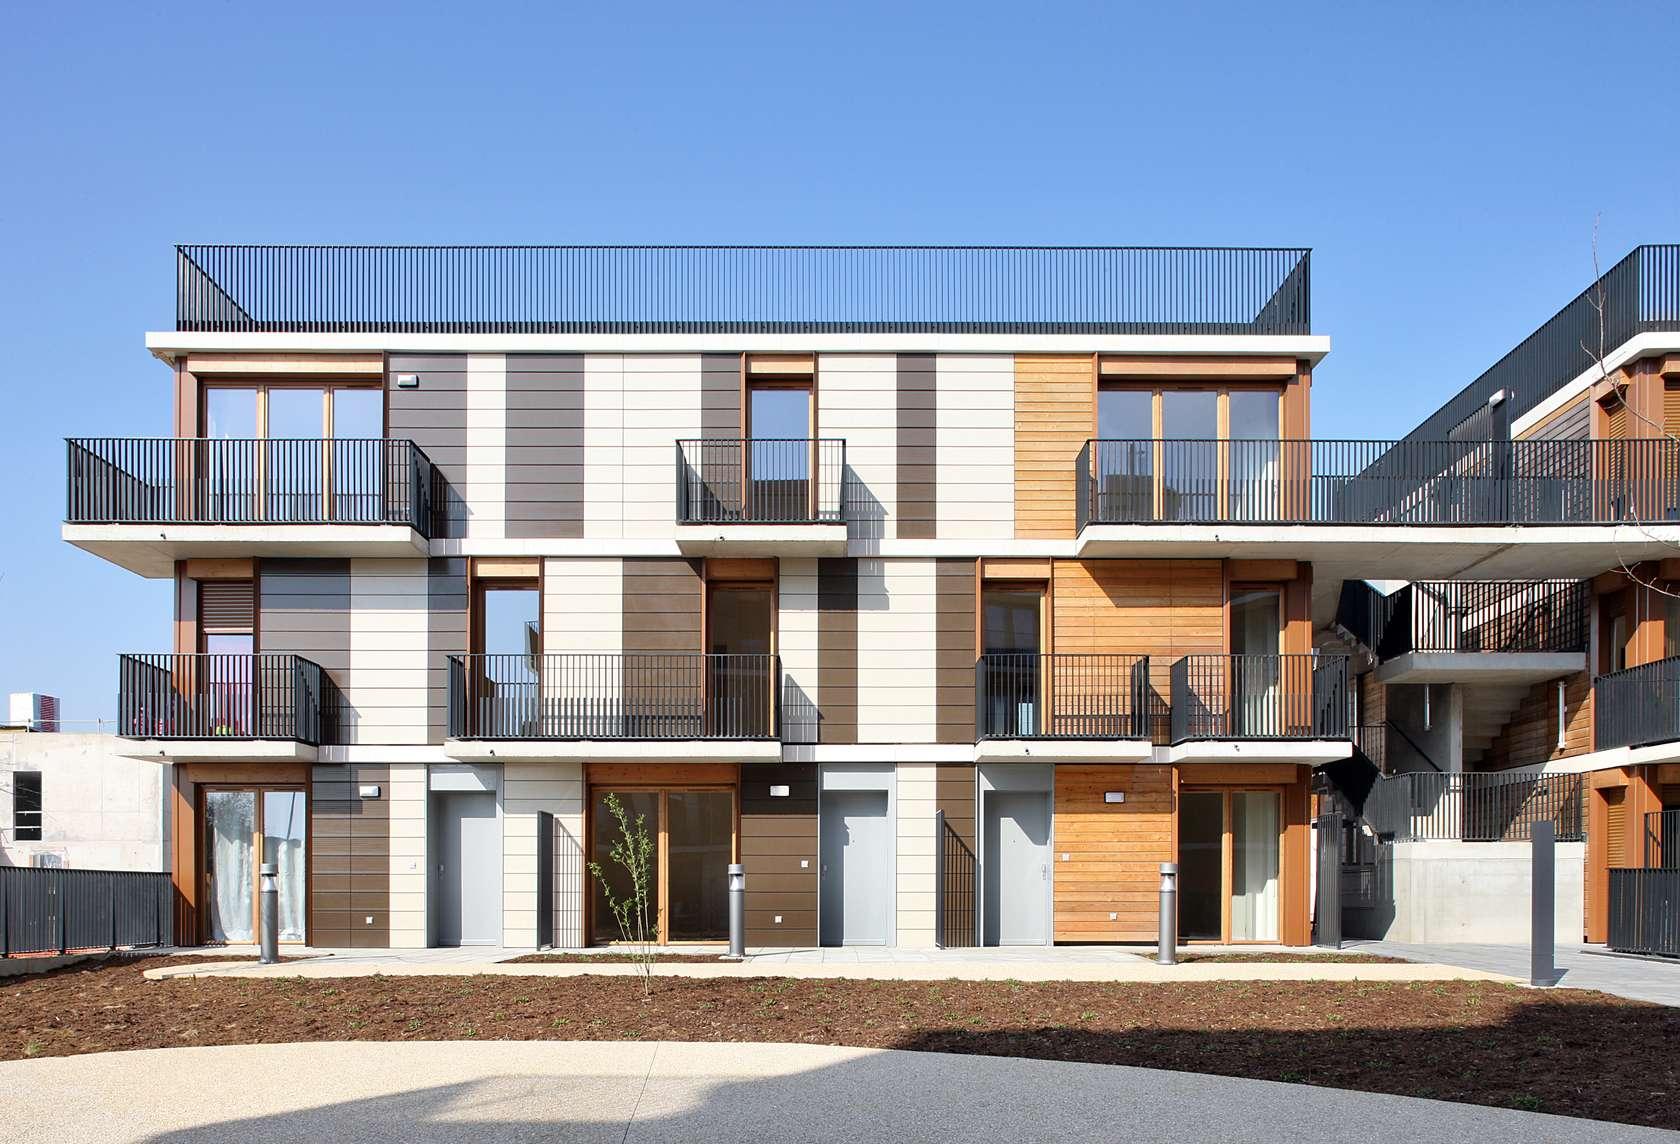 Gelin lafon architizer for Architecture windows